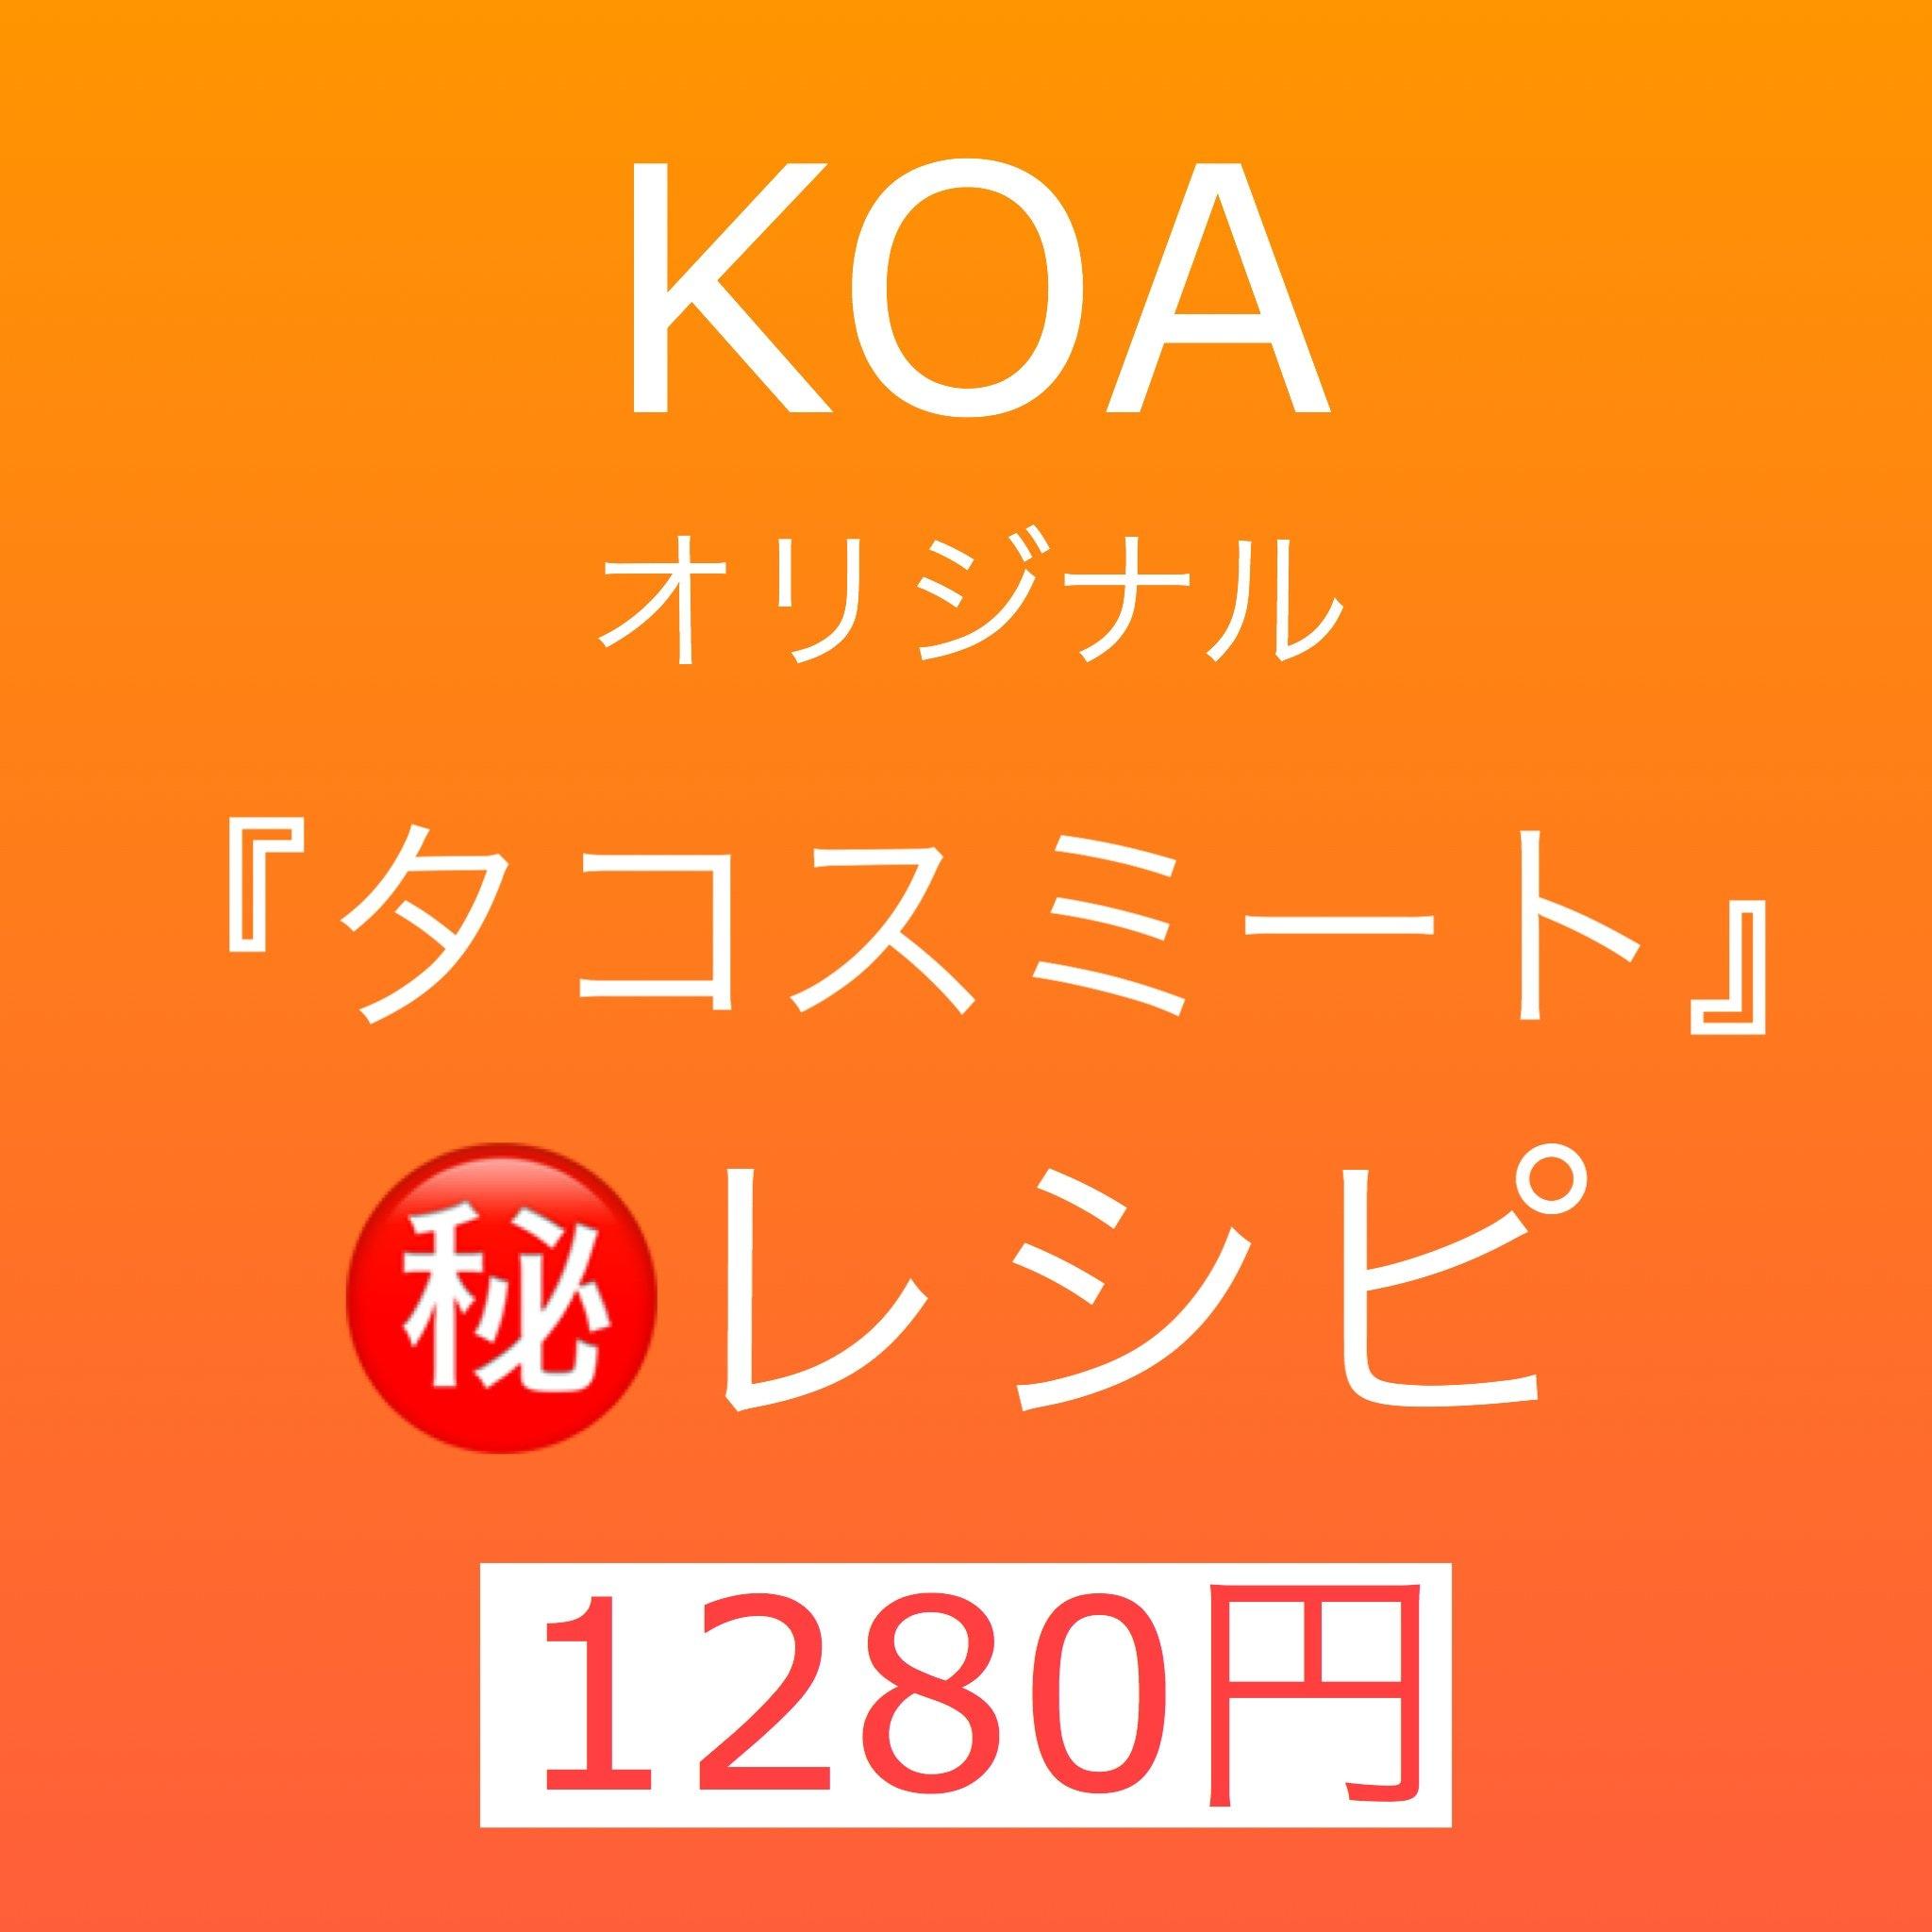 KOAの【タコスミート】㊙️レシピ🎶 1280円のイメージその1